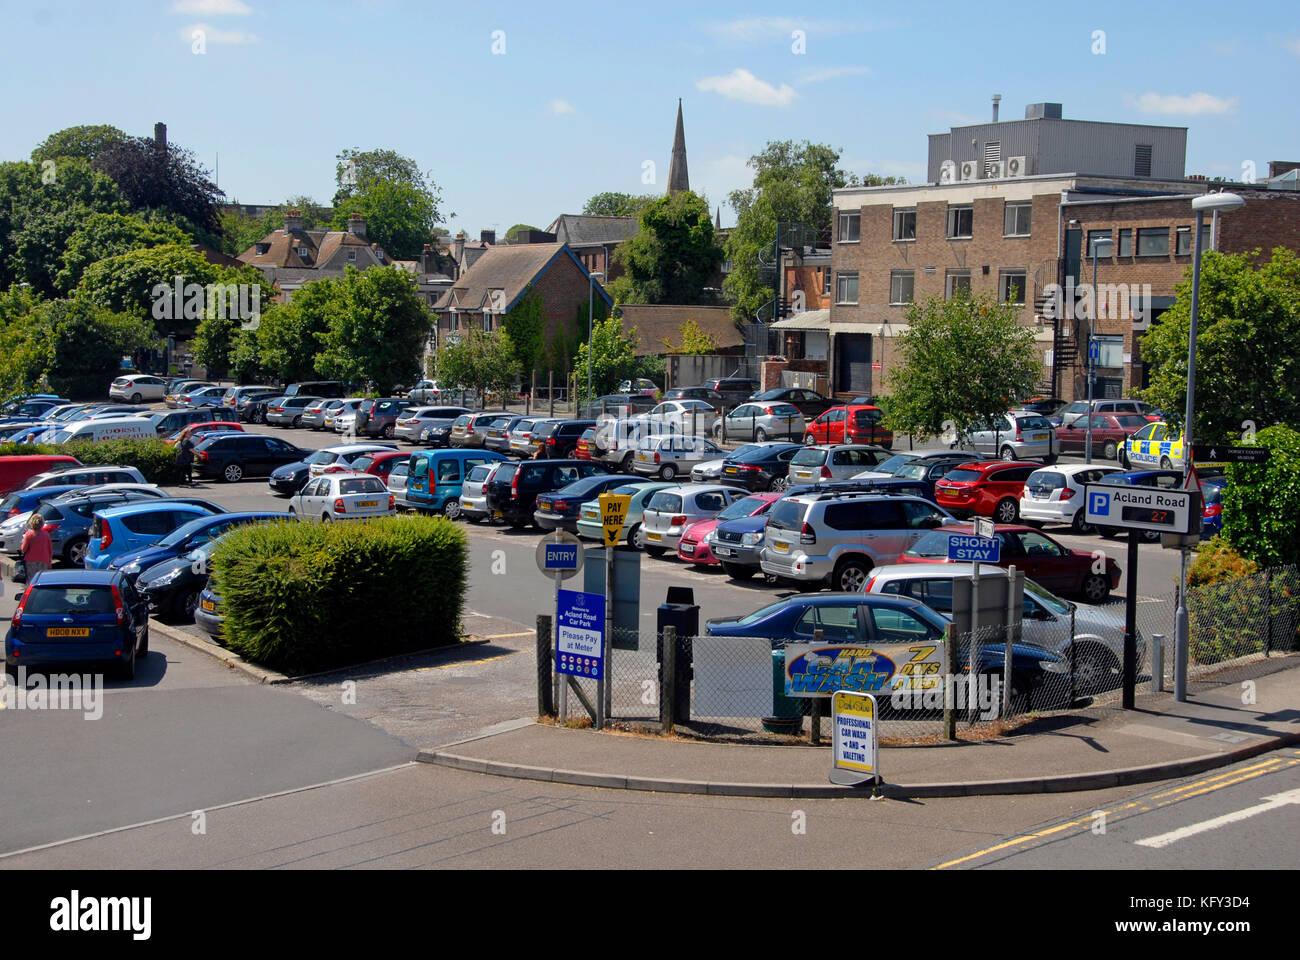 Short Term Car Rental London